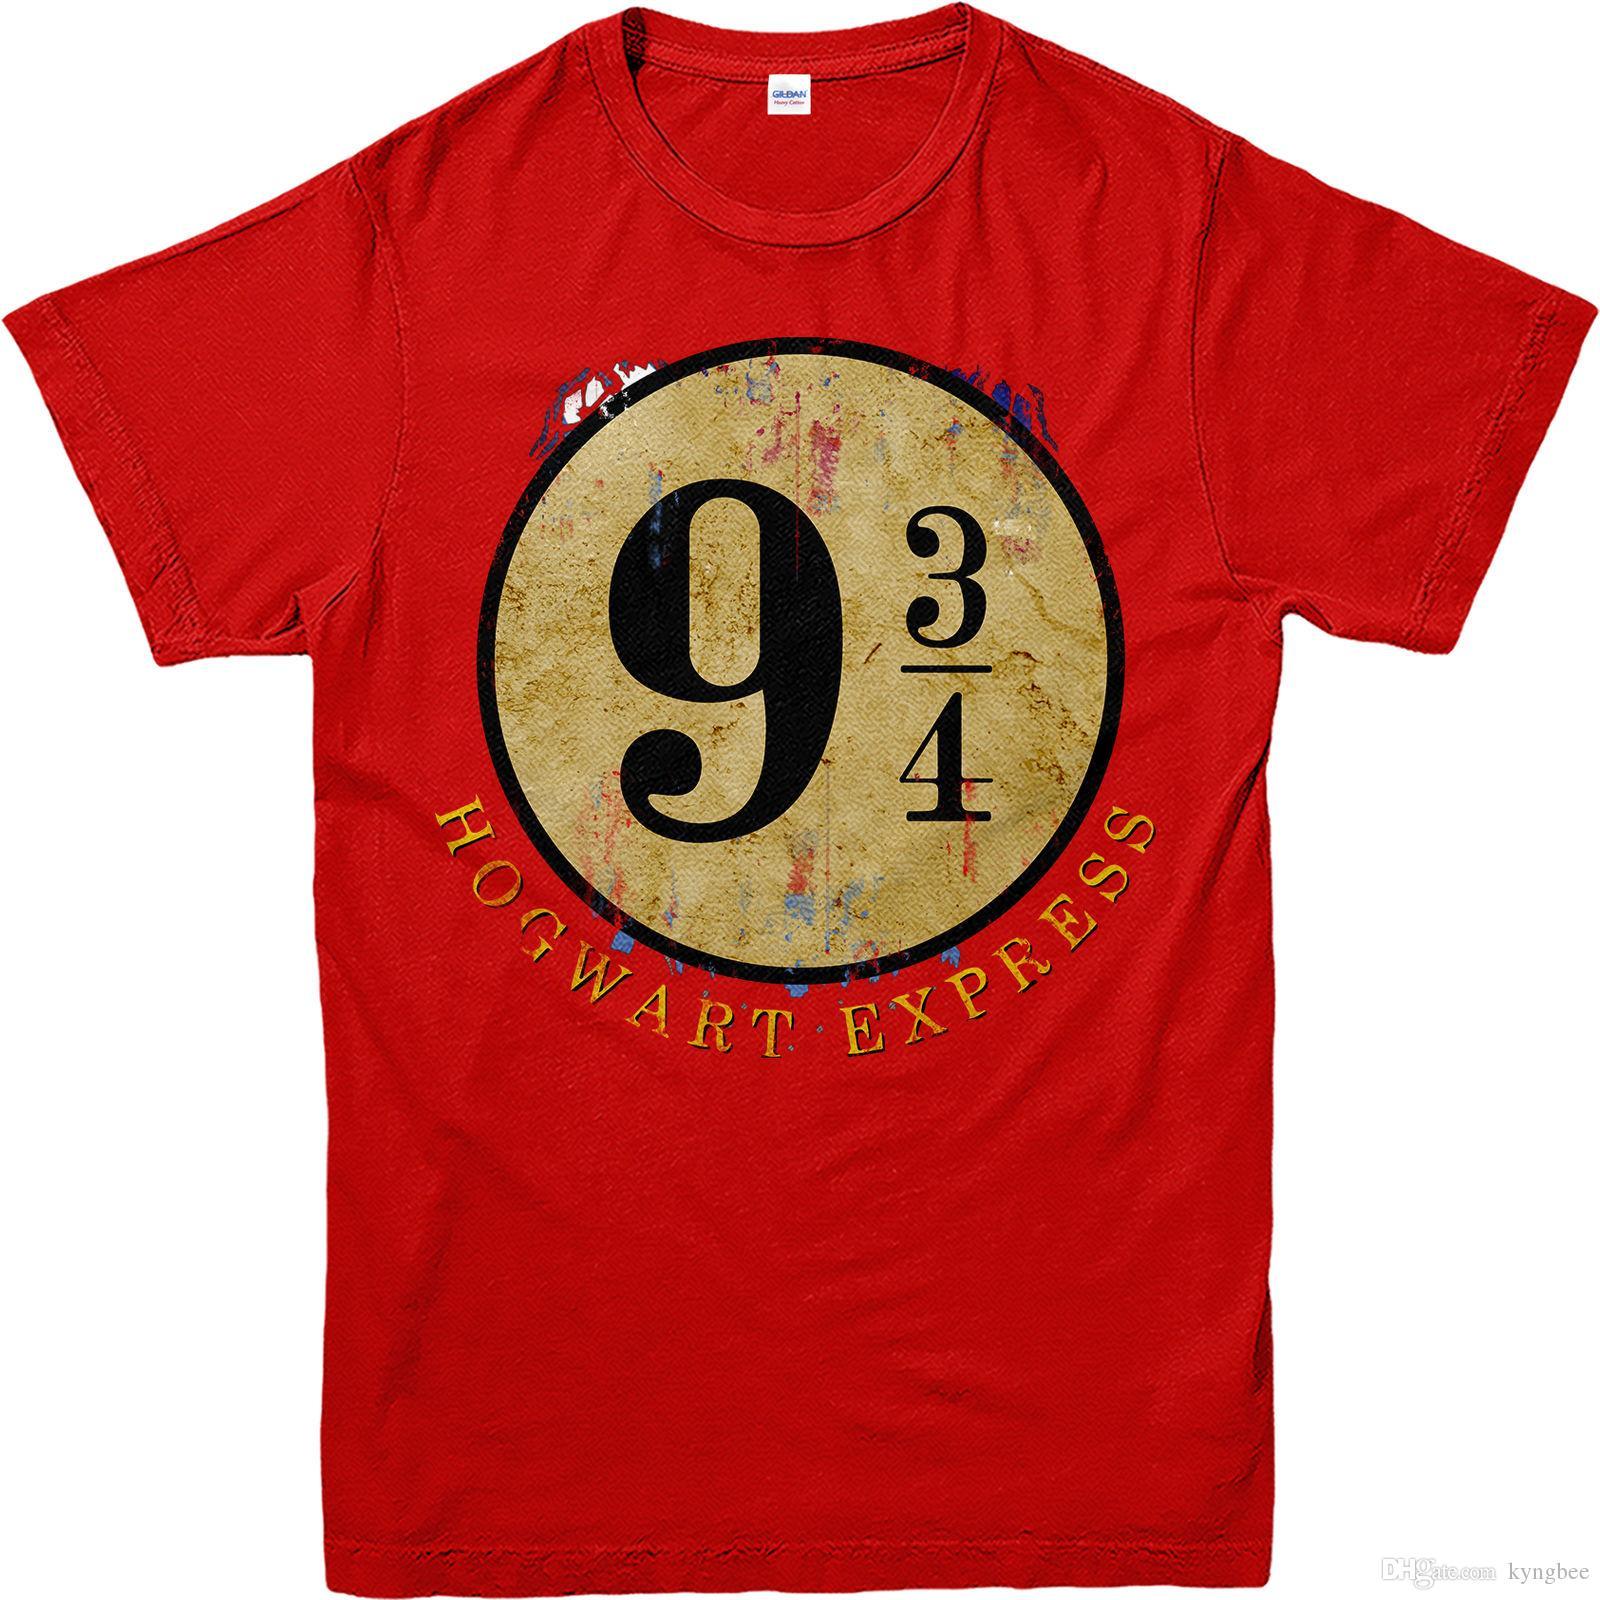 5c6cd41a5 Compre Camiseta Harry Potter